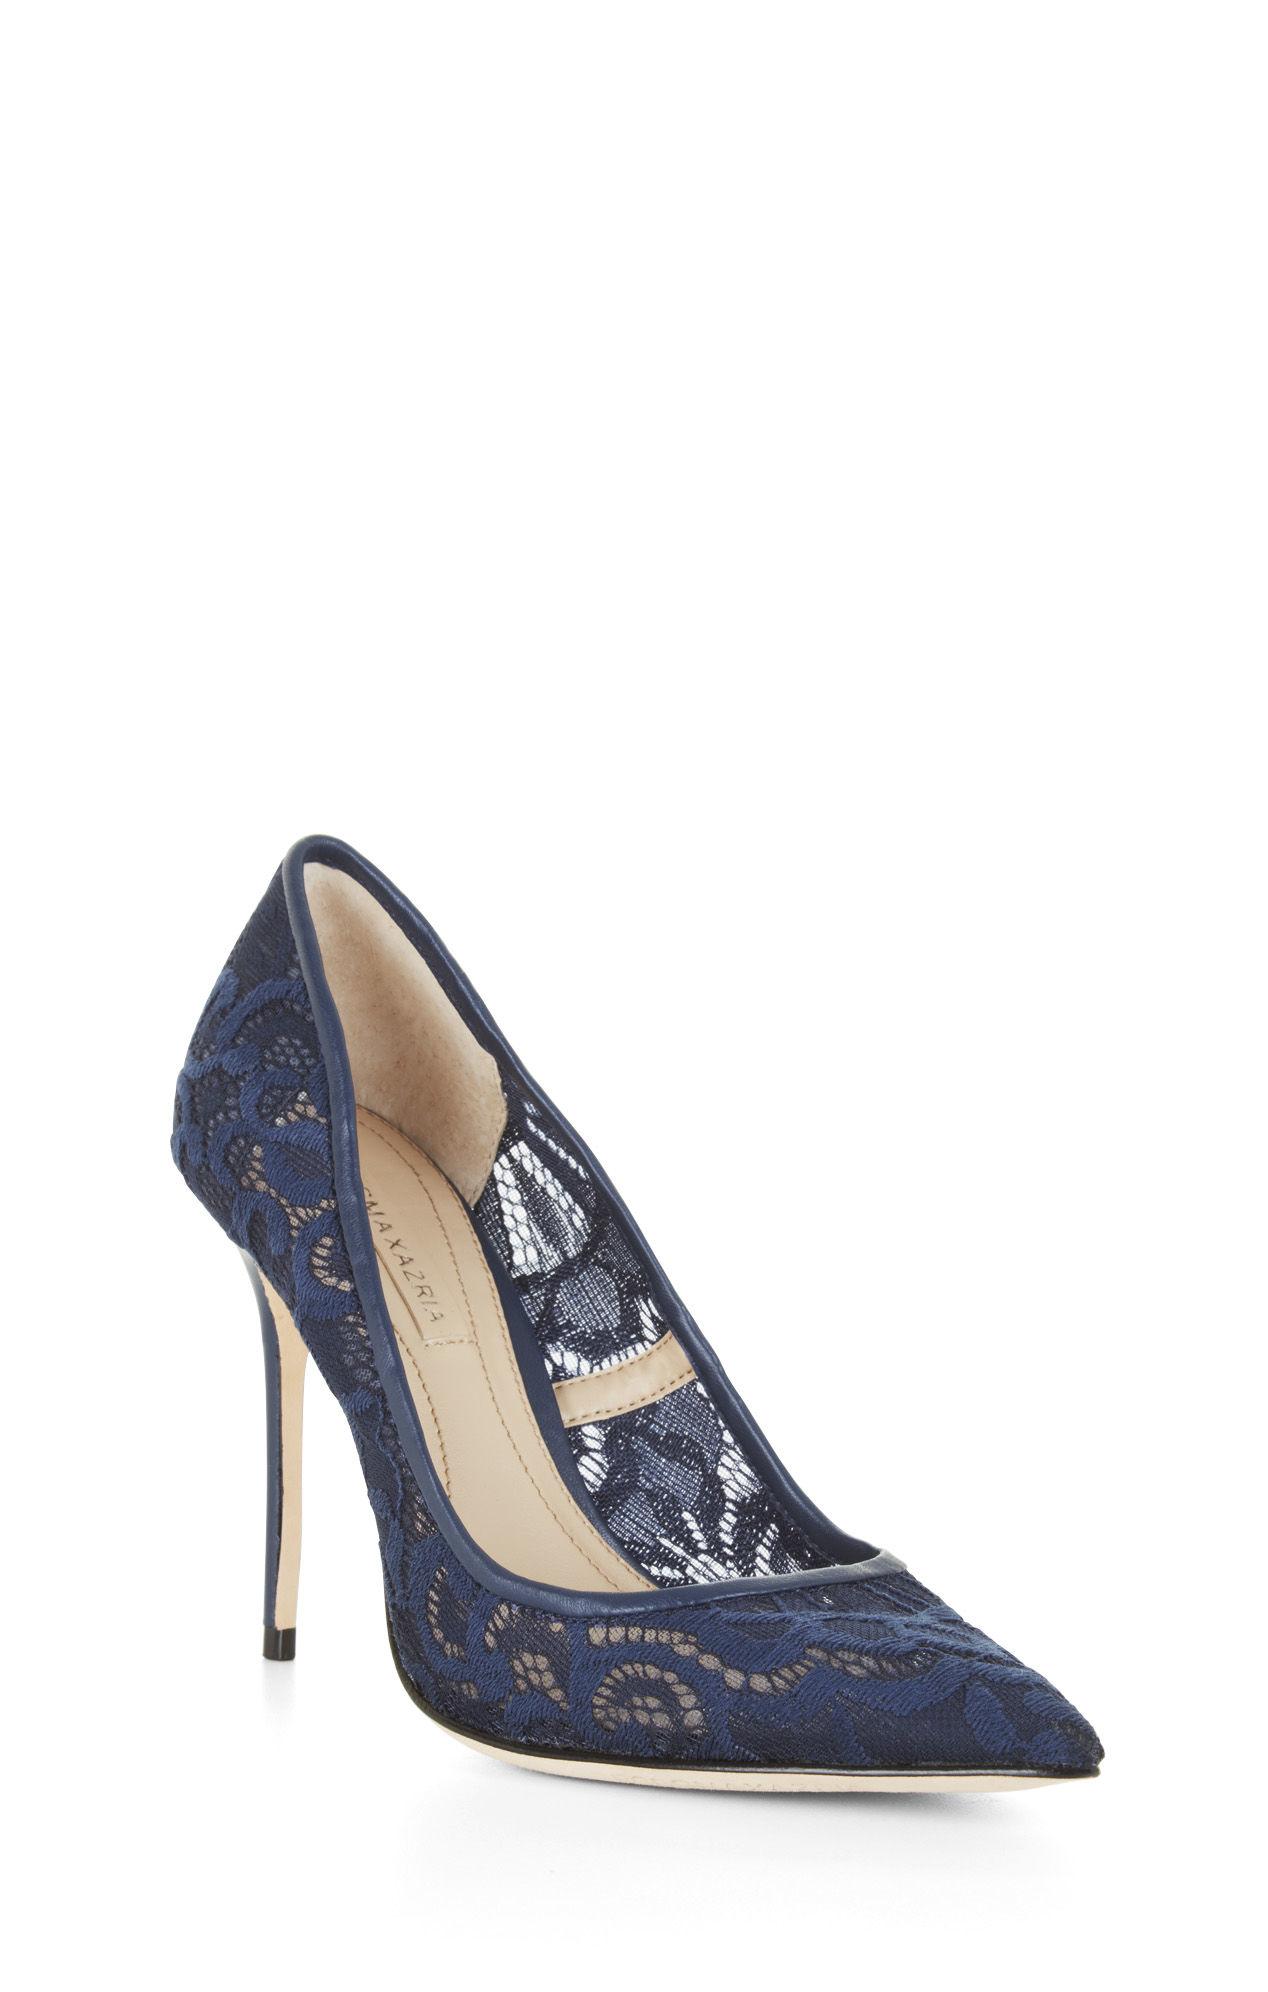 Midnight Blue High Heels